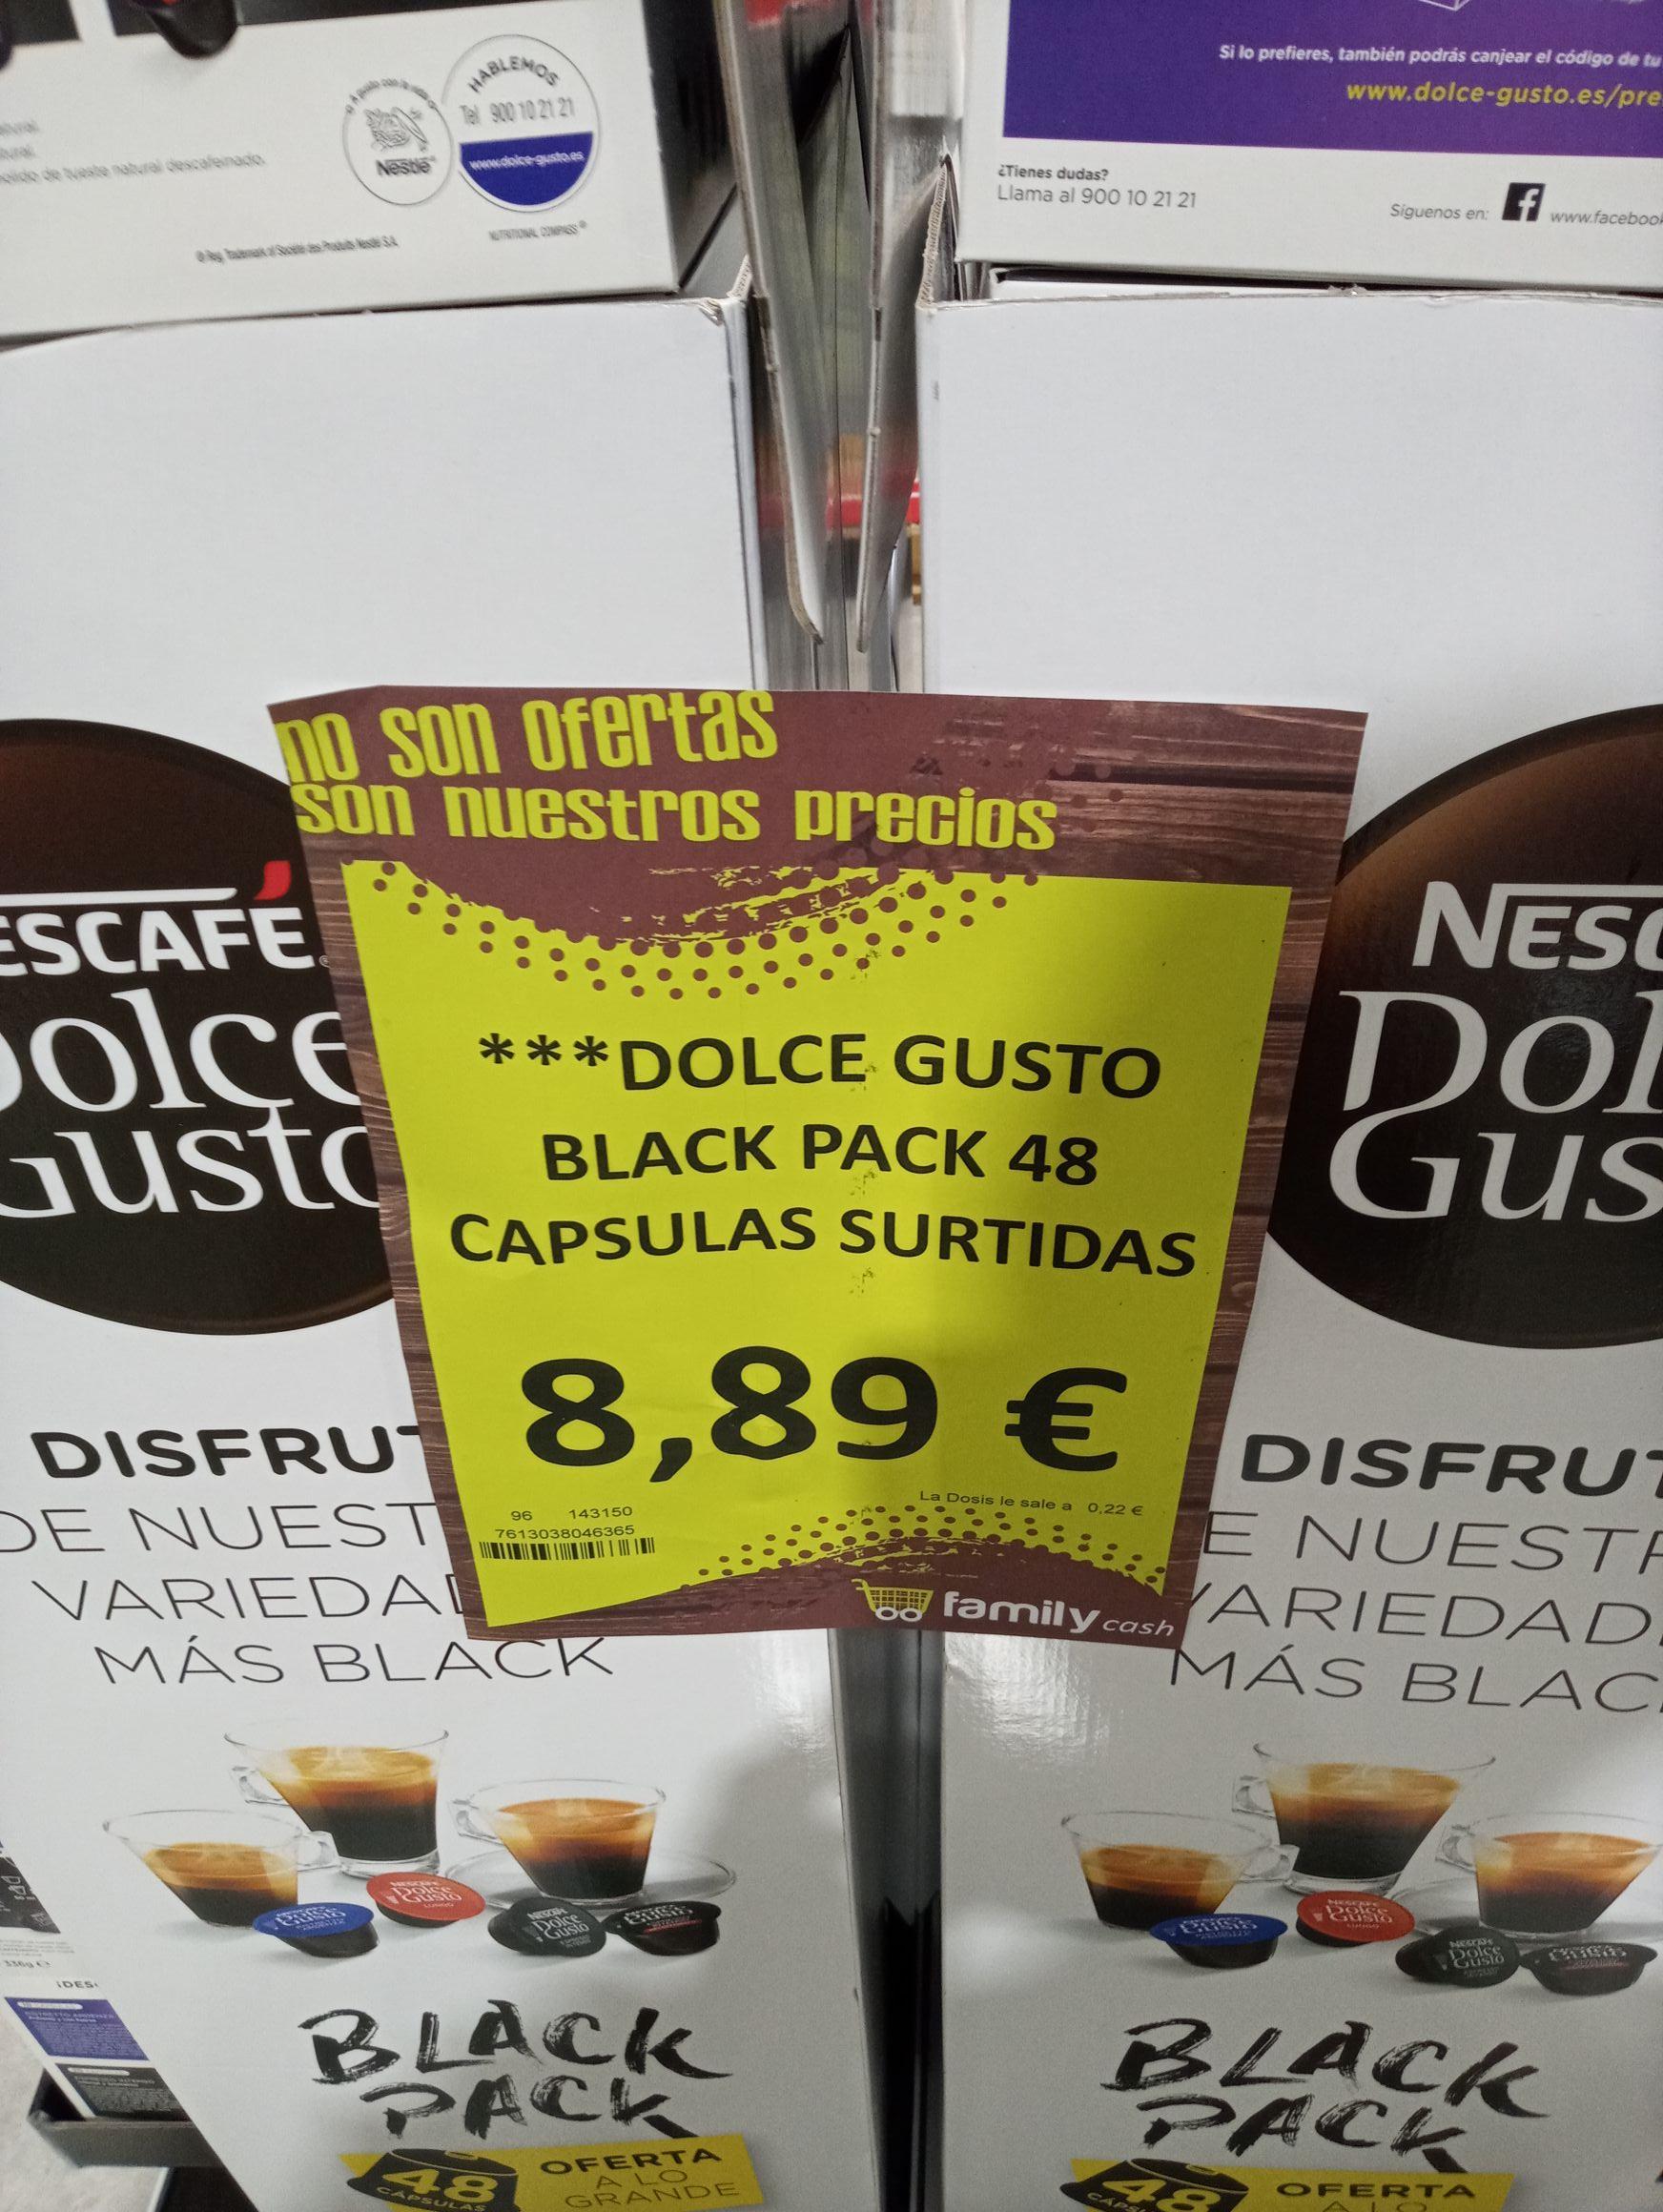 Pack 48 capsulas de dolcegusto (FamilyCash Alzira)